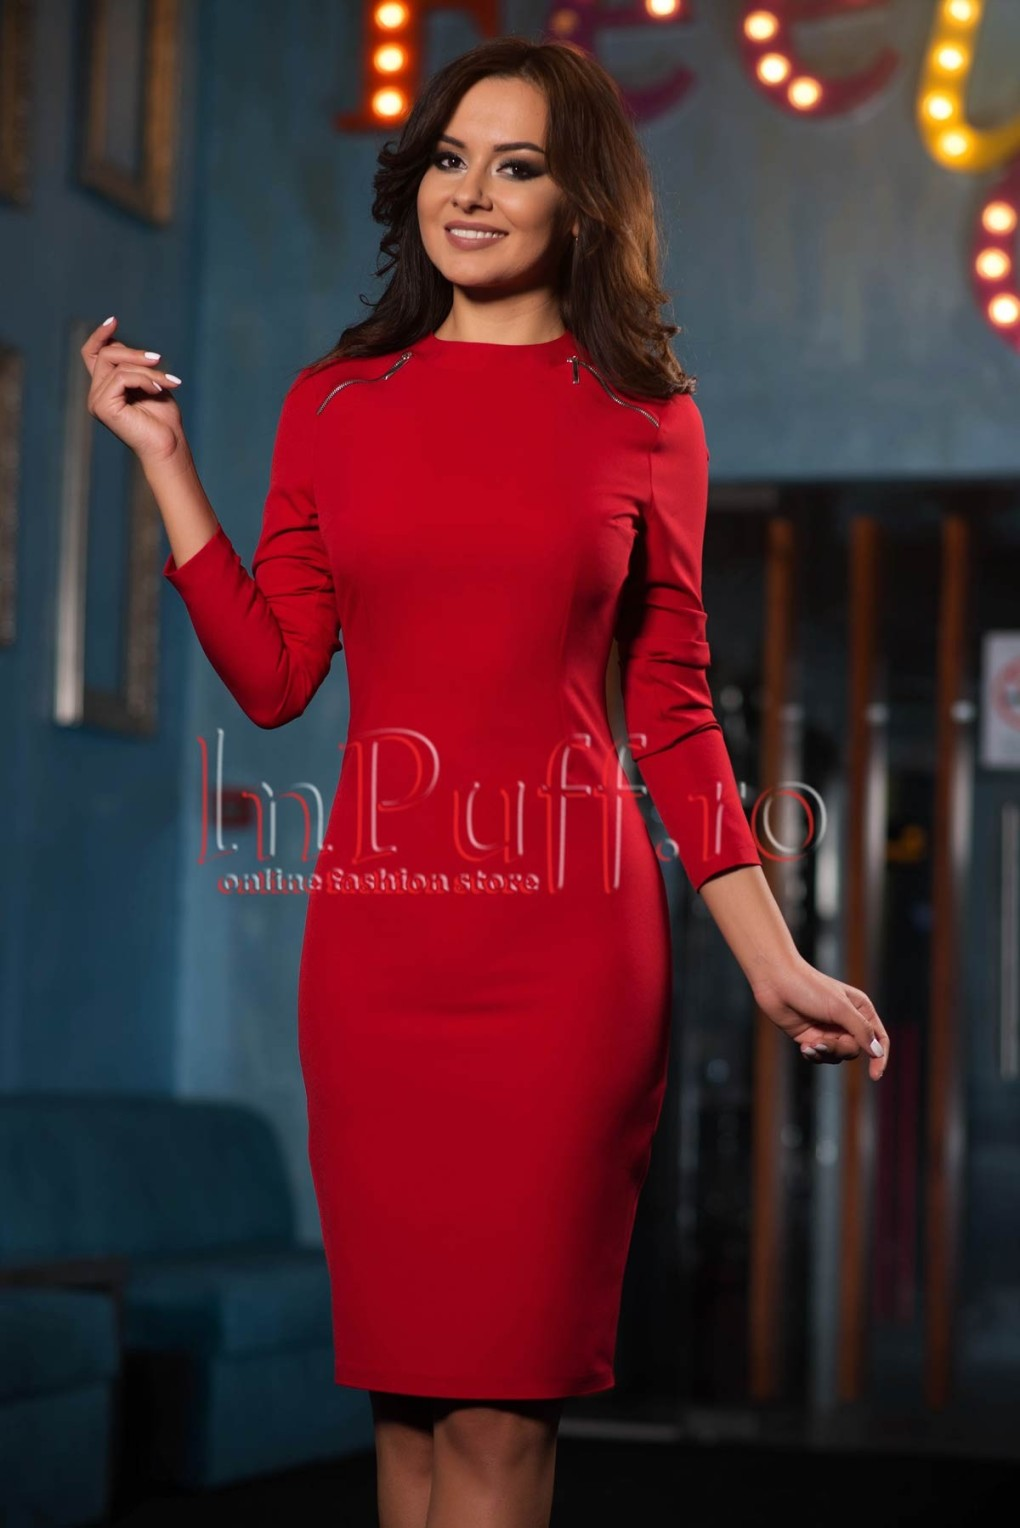 rochie-eleganta-rosie-cu-fermoare-argintii-1507625803-4